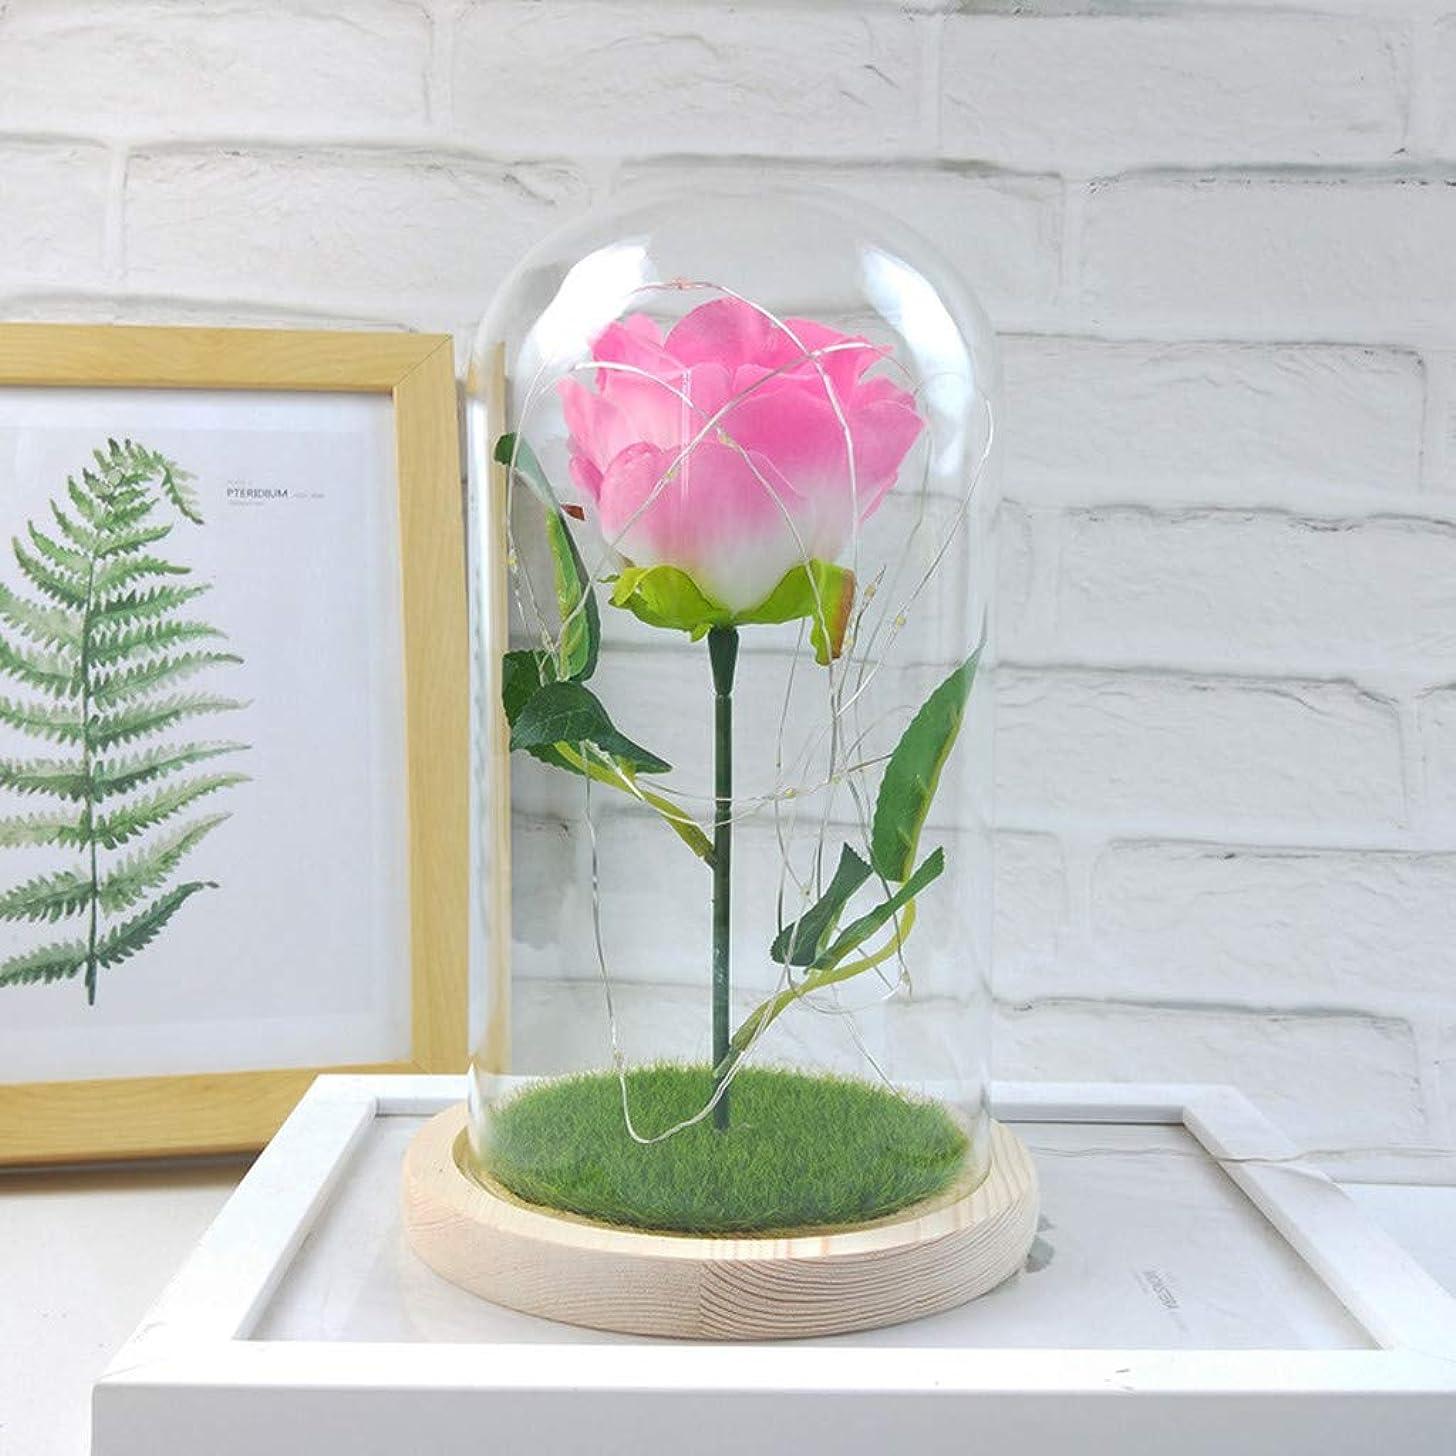 TIANMI Romantic Glass Rose Wedding Decoration Home Furnishing